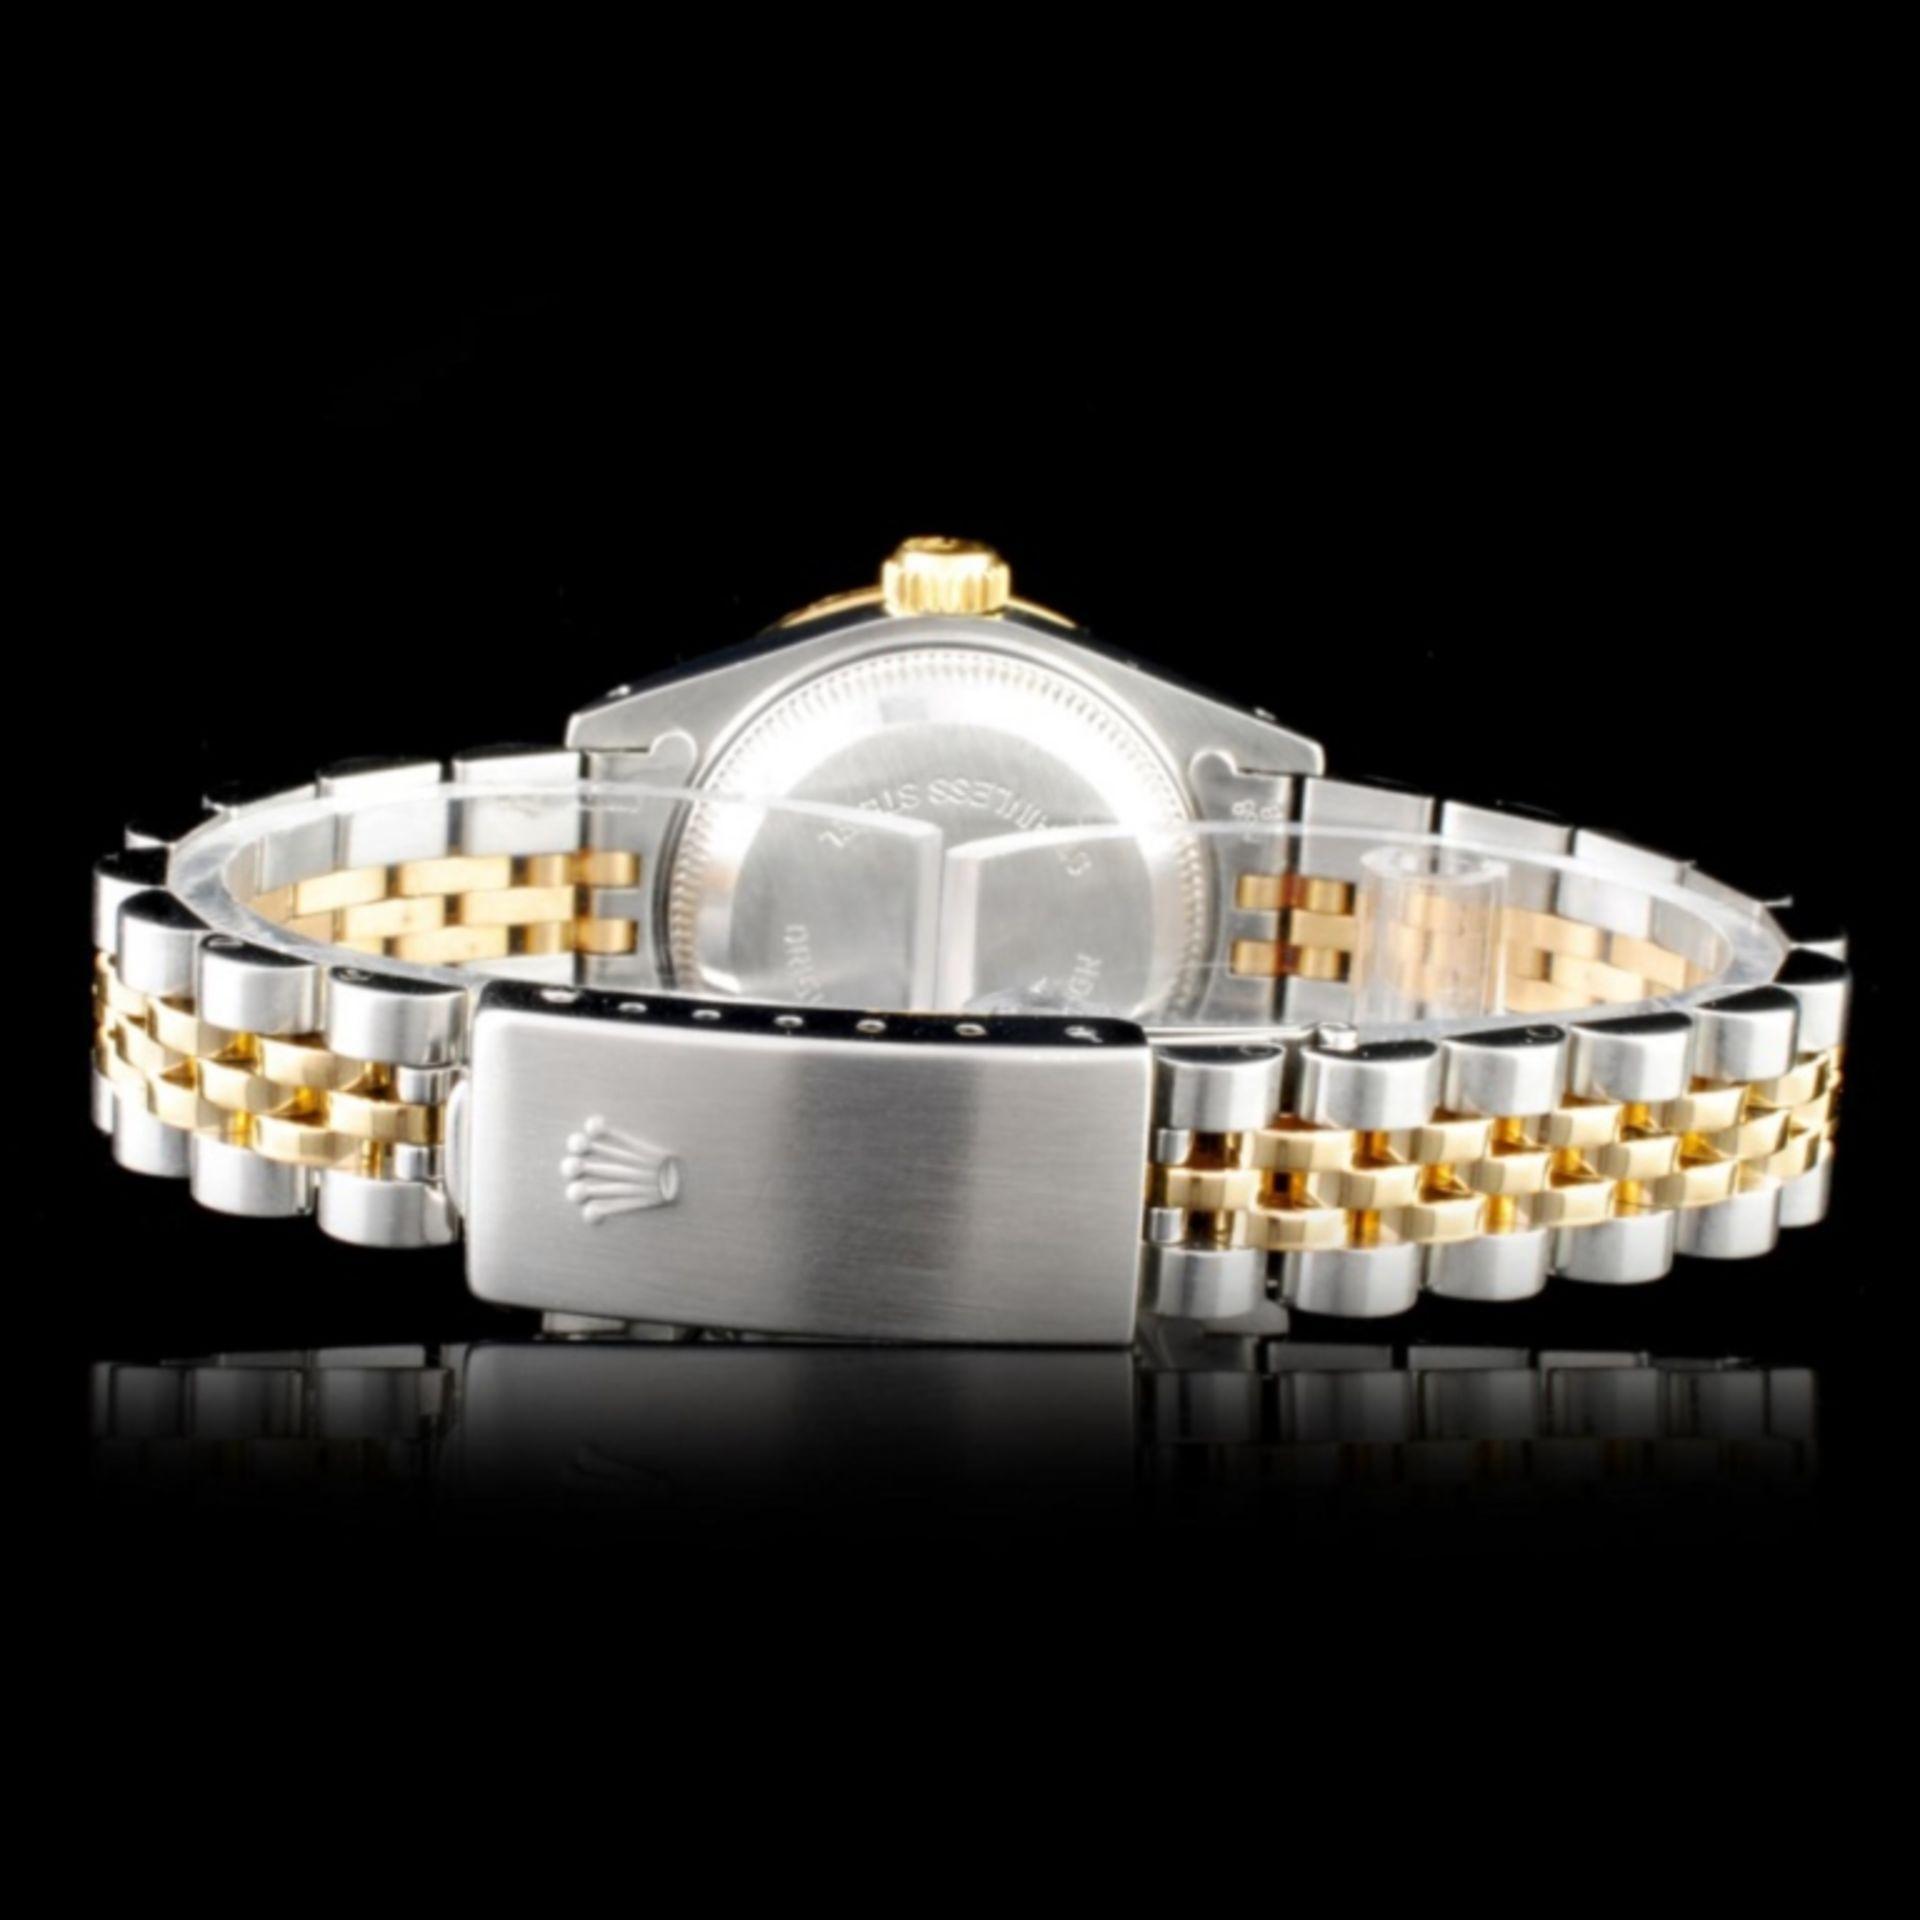 Rolex YG/SS DateJust Diamond Ladies Watch - Image 3 of 5